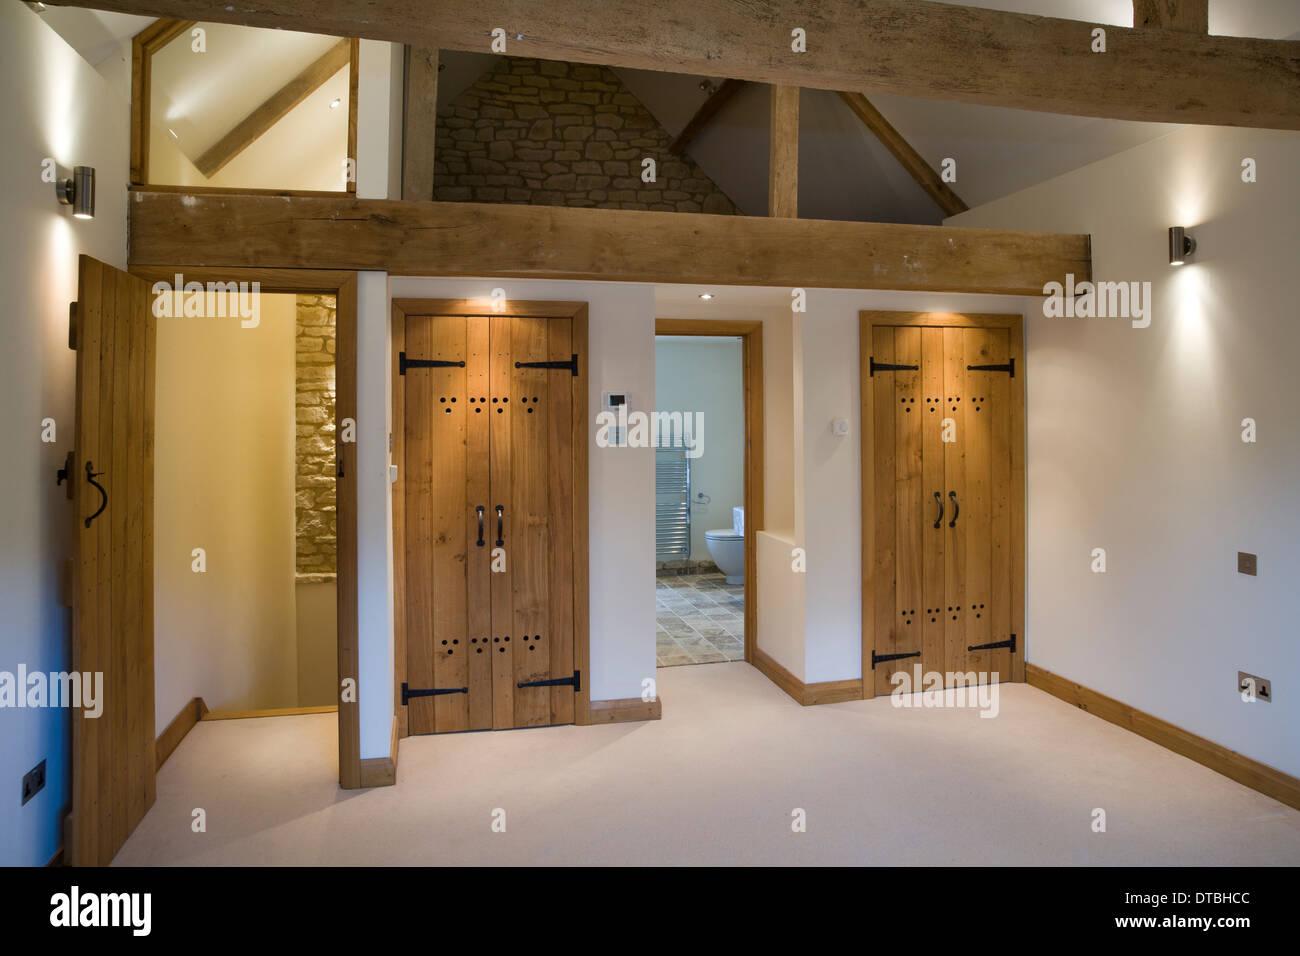 Upmarket attic bedroom conversion with ensuite bathroom and ...